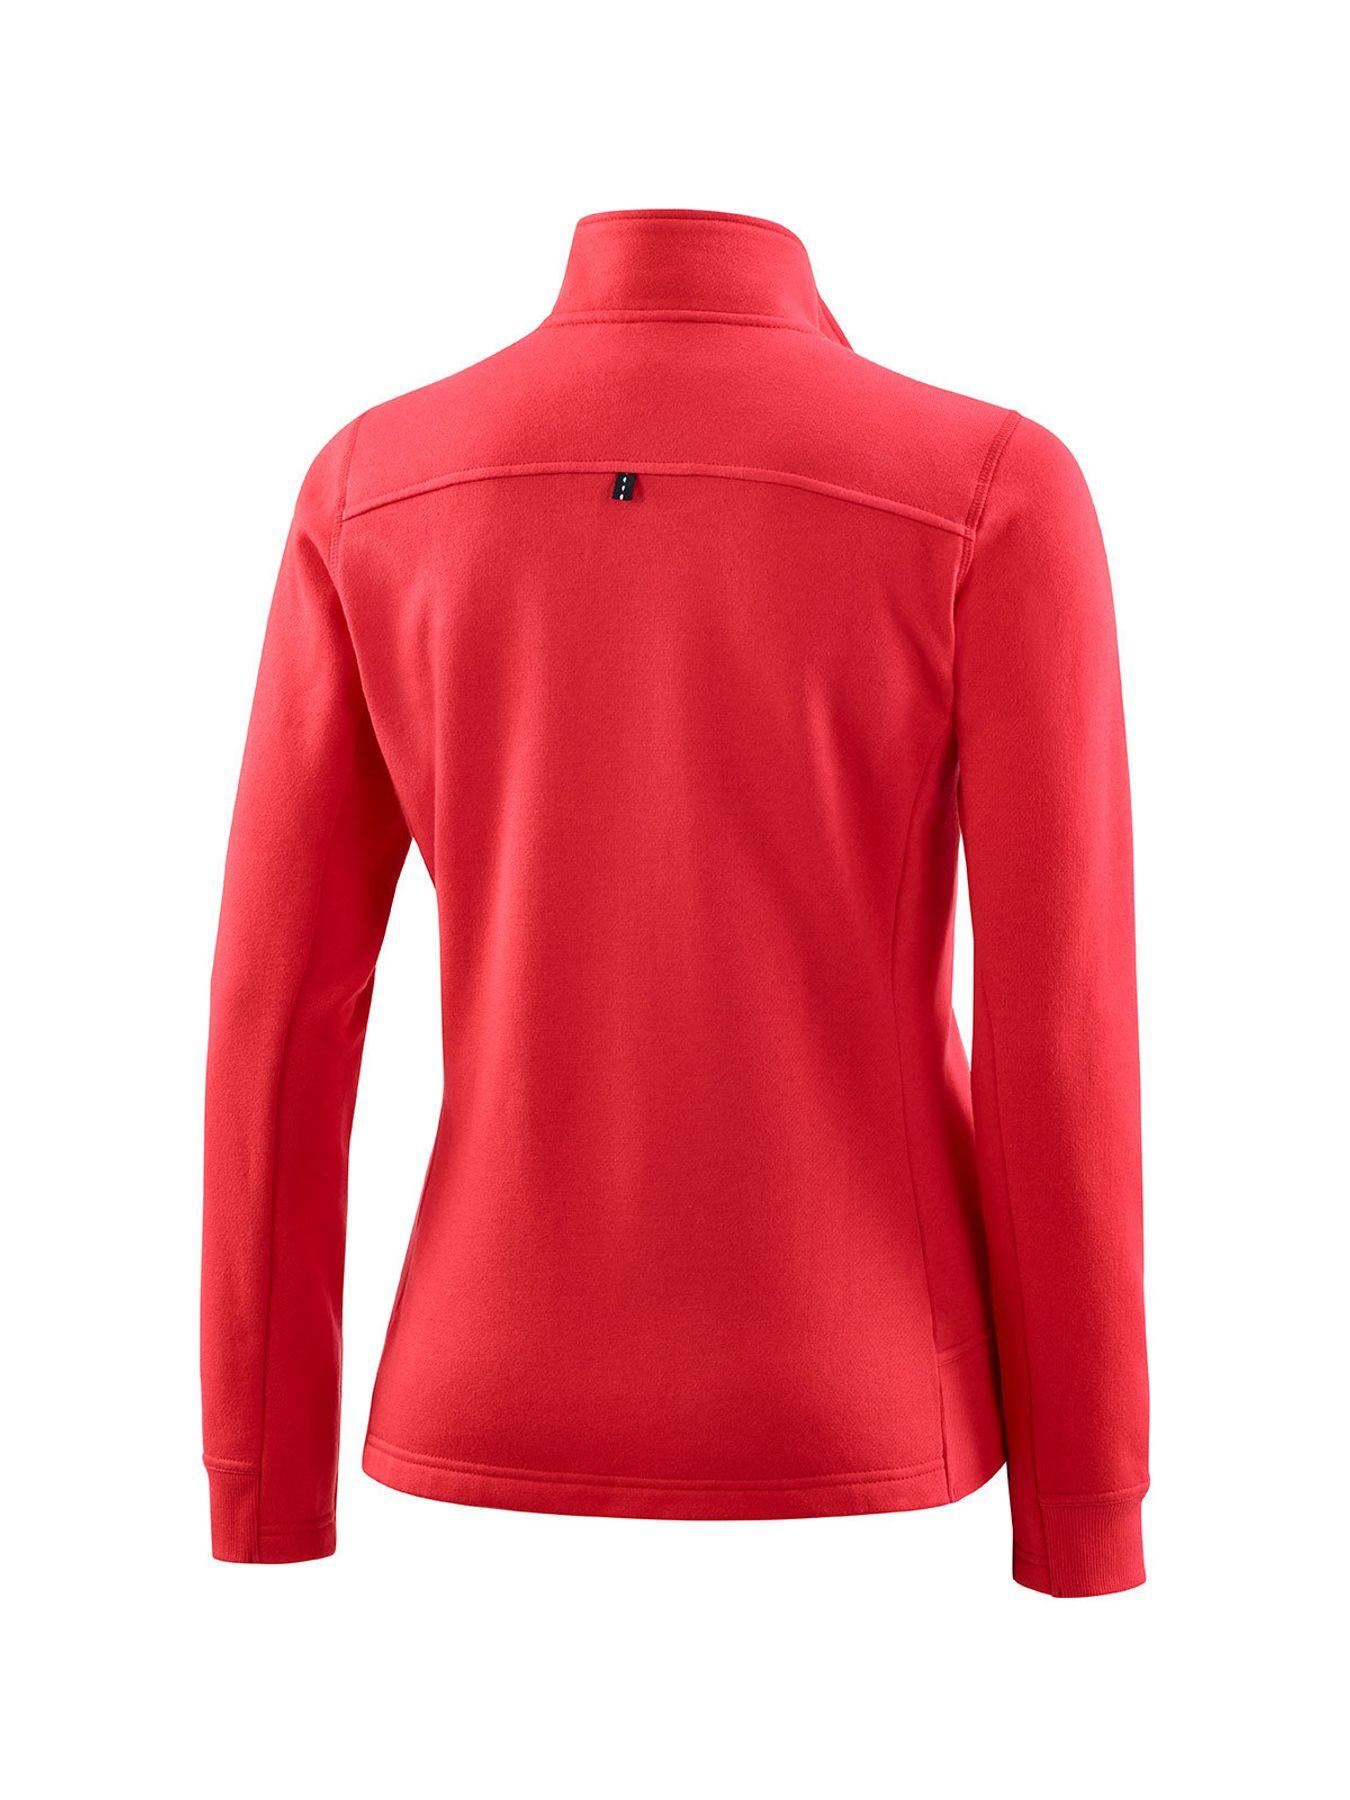 Joy - Damen Sport und Freizeit Jacke in mehreren Farben, Paulina (34500) – Bild 9